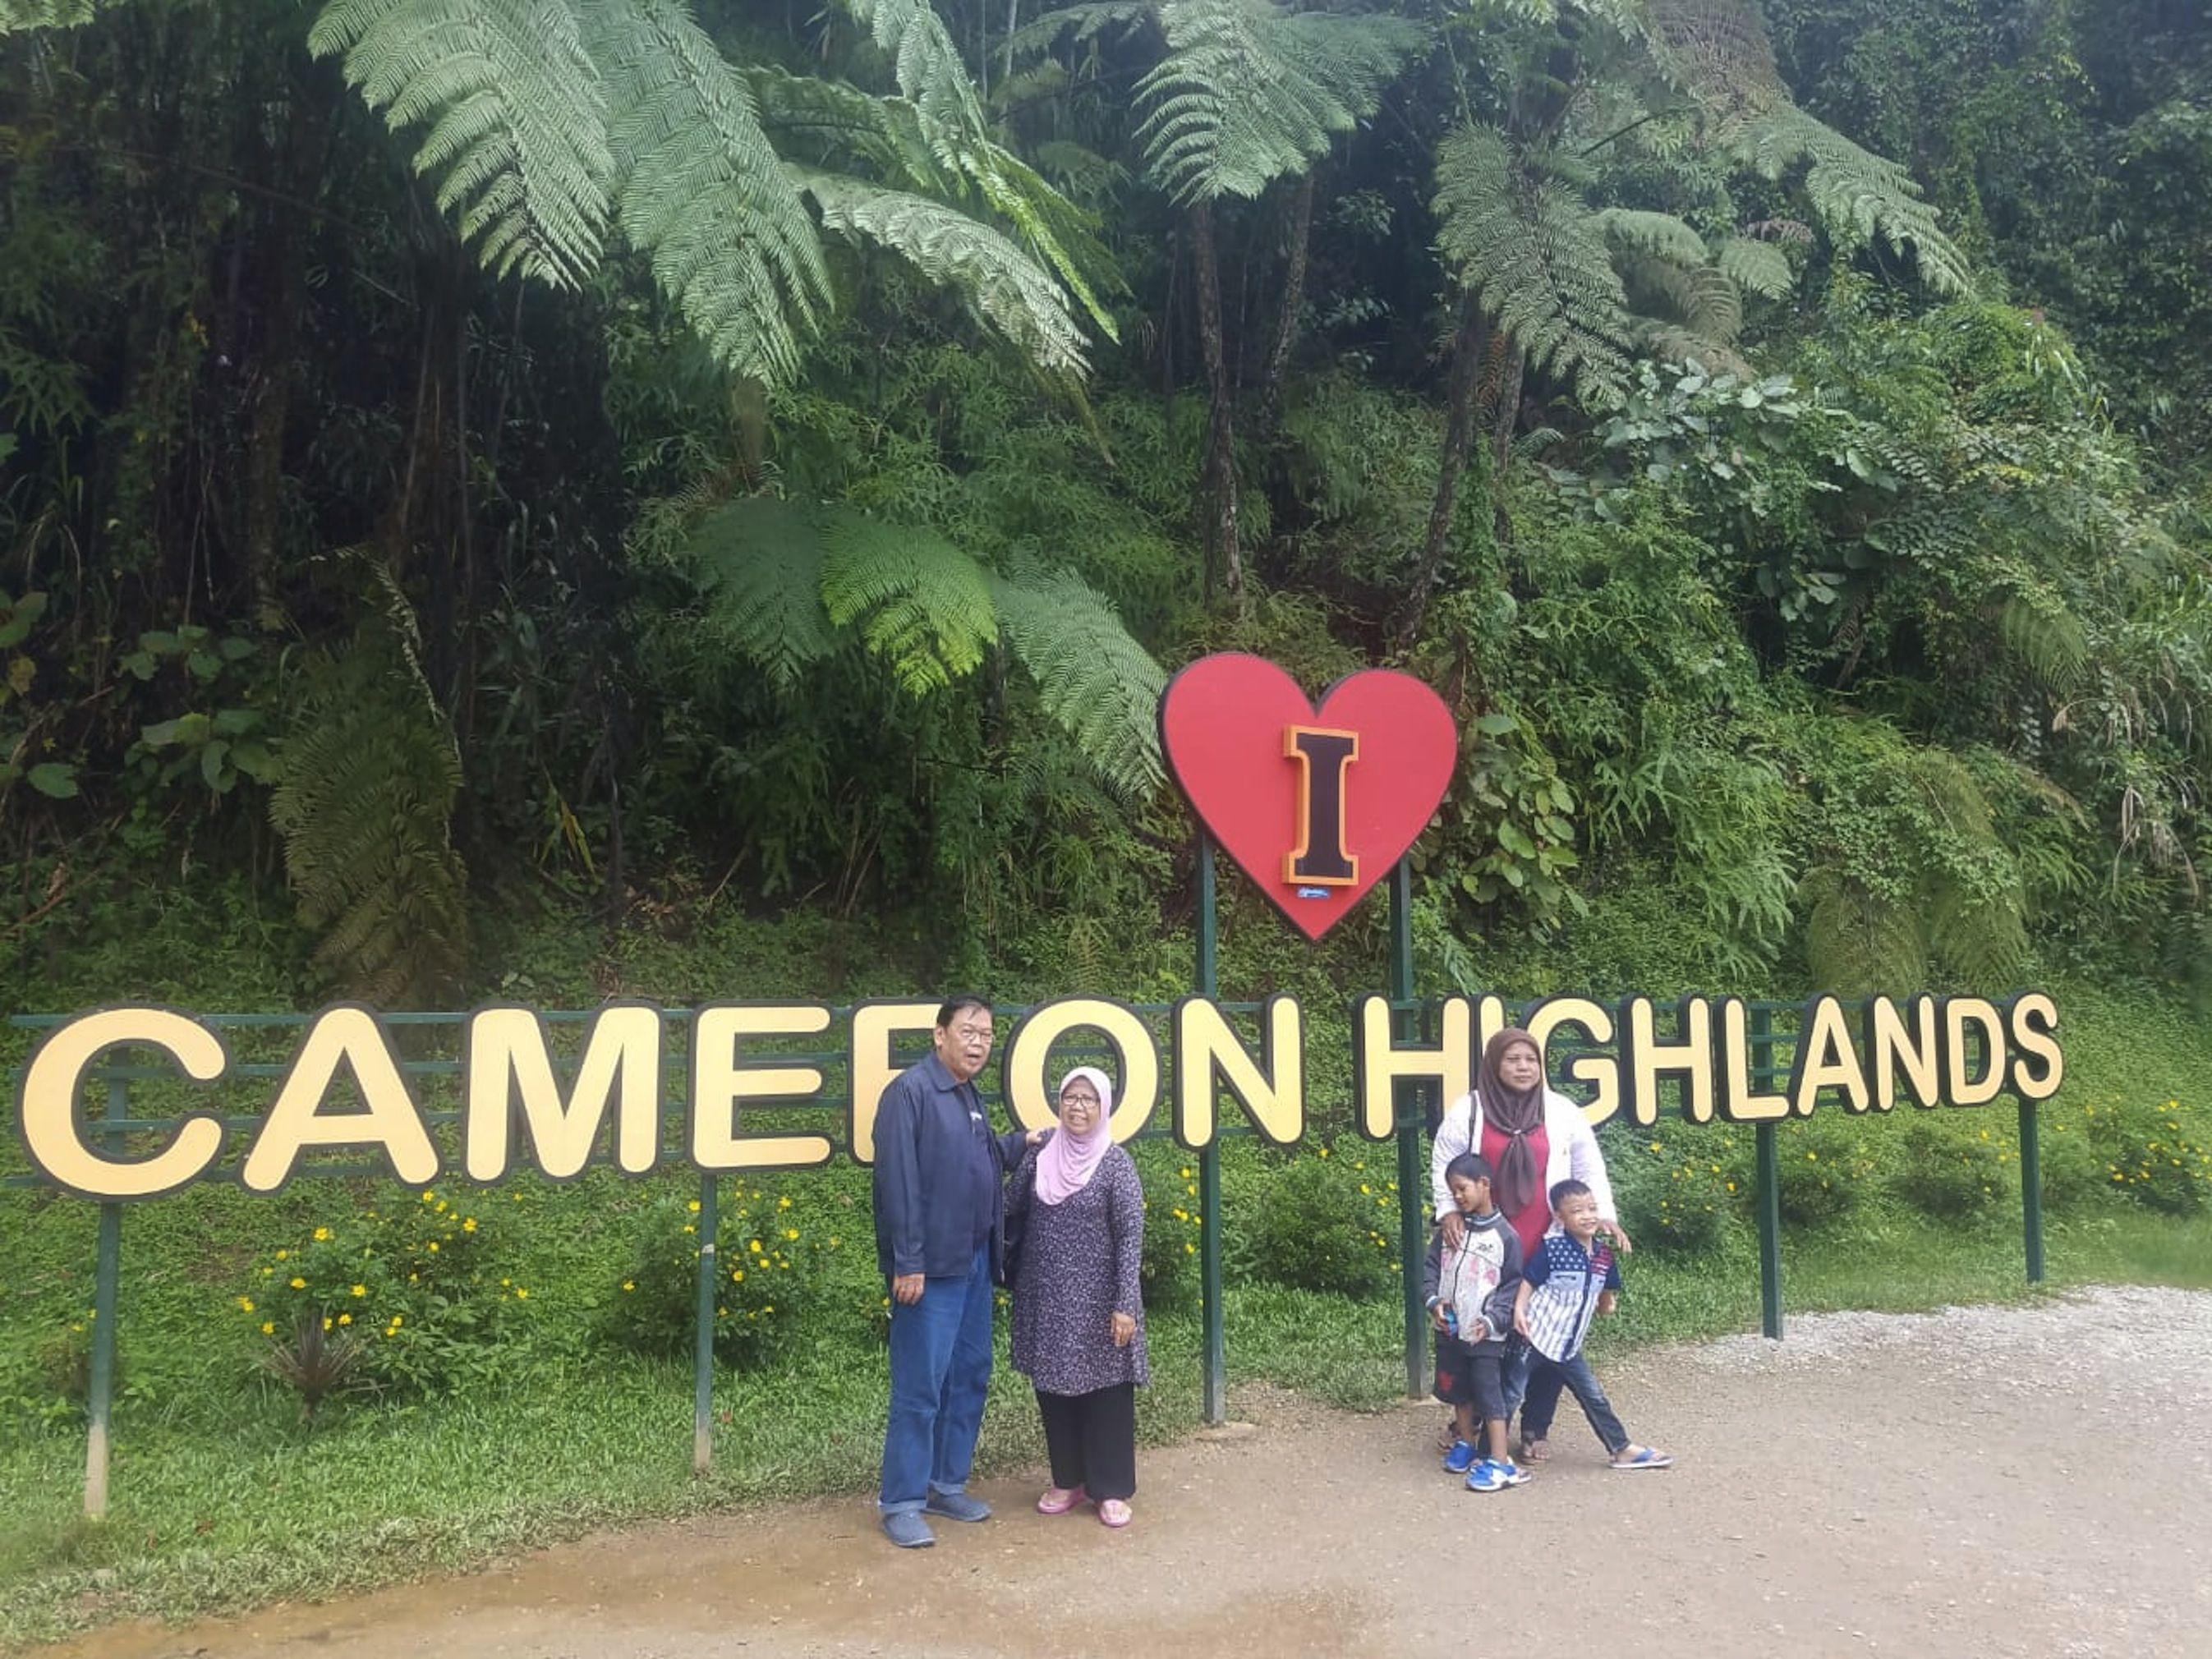 Cameron Highlands Objek Wisata Berpotensi Geser Popularitas